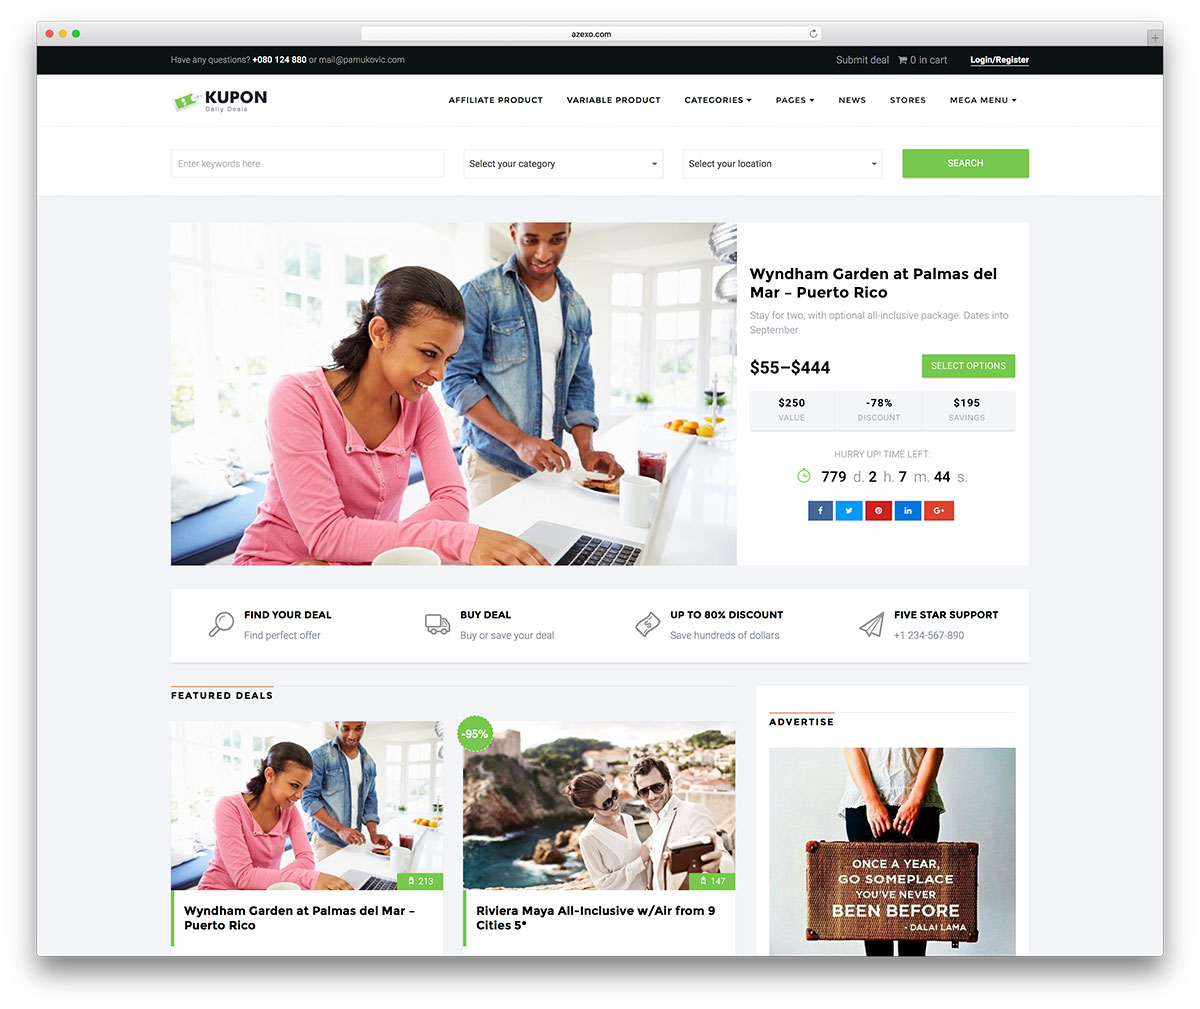 kupon-daily-deals-affilate-wordpress-theme